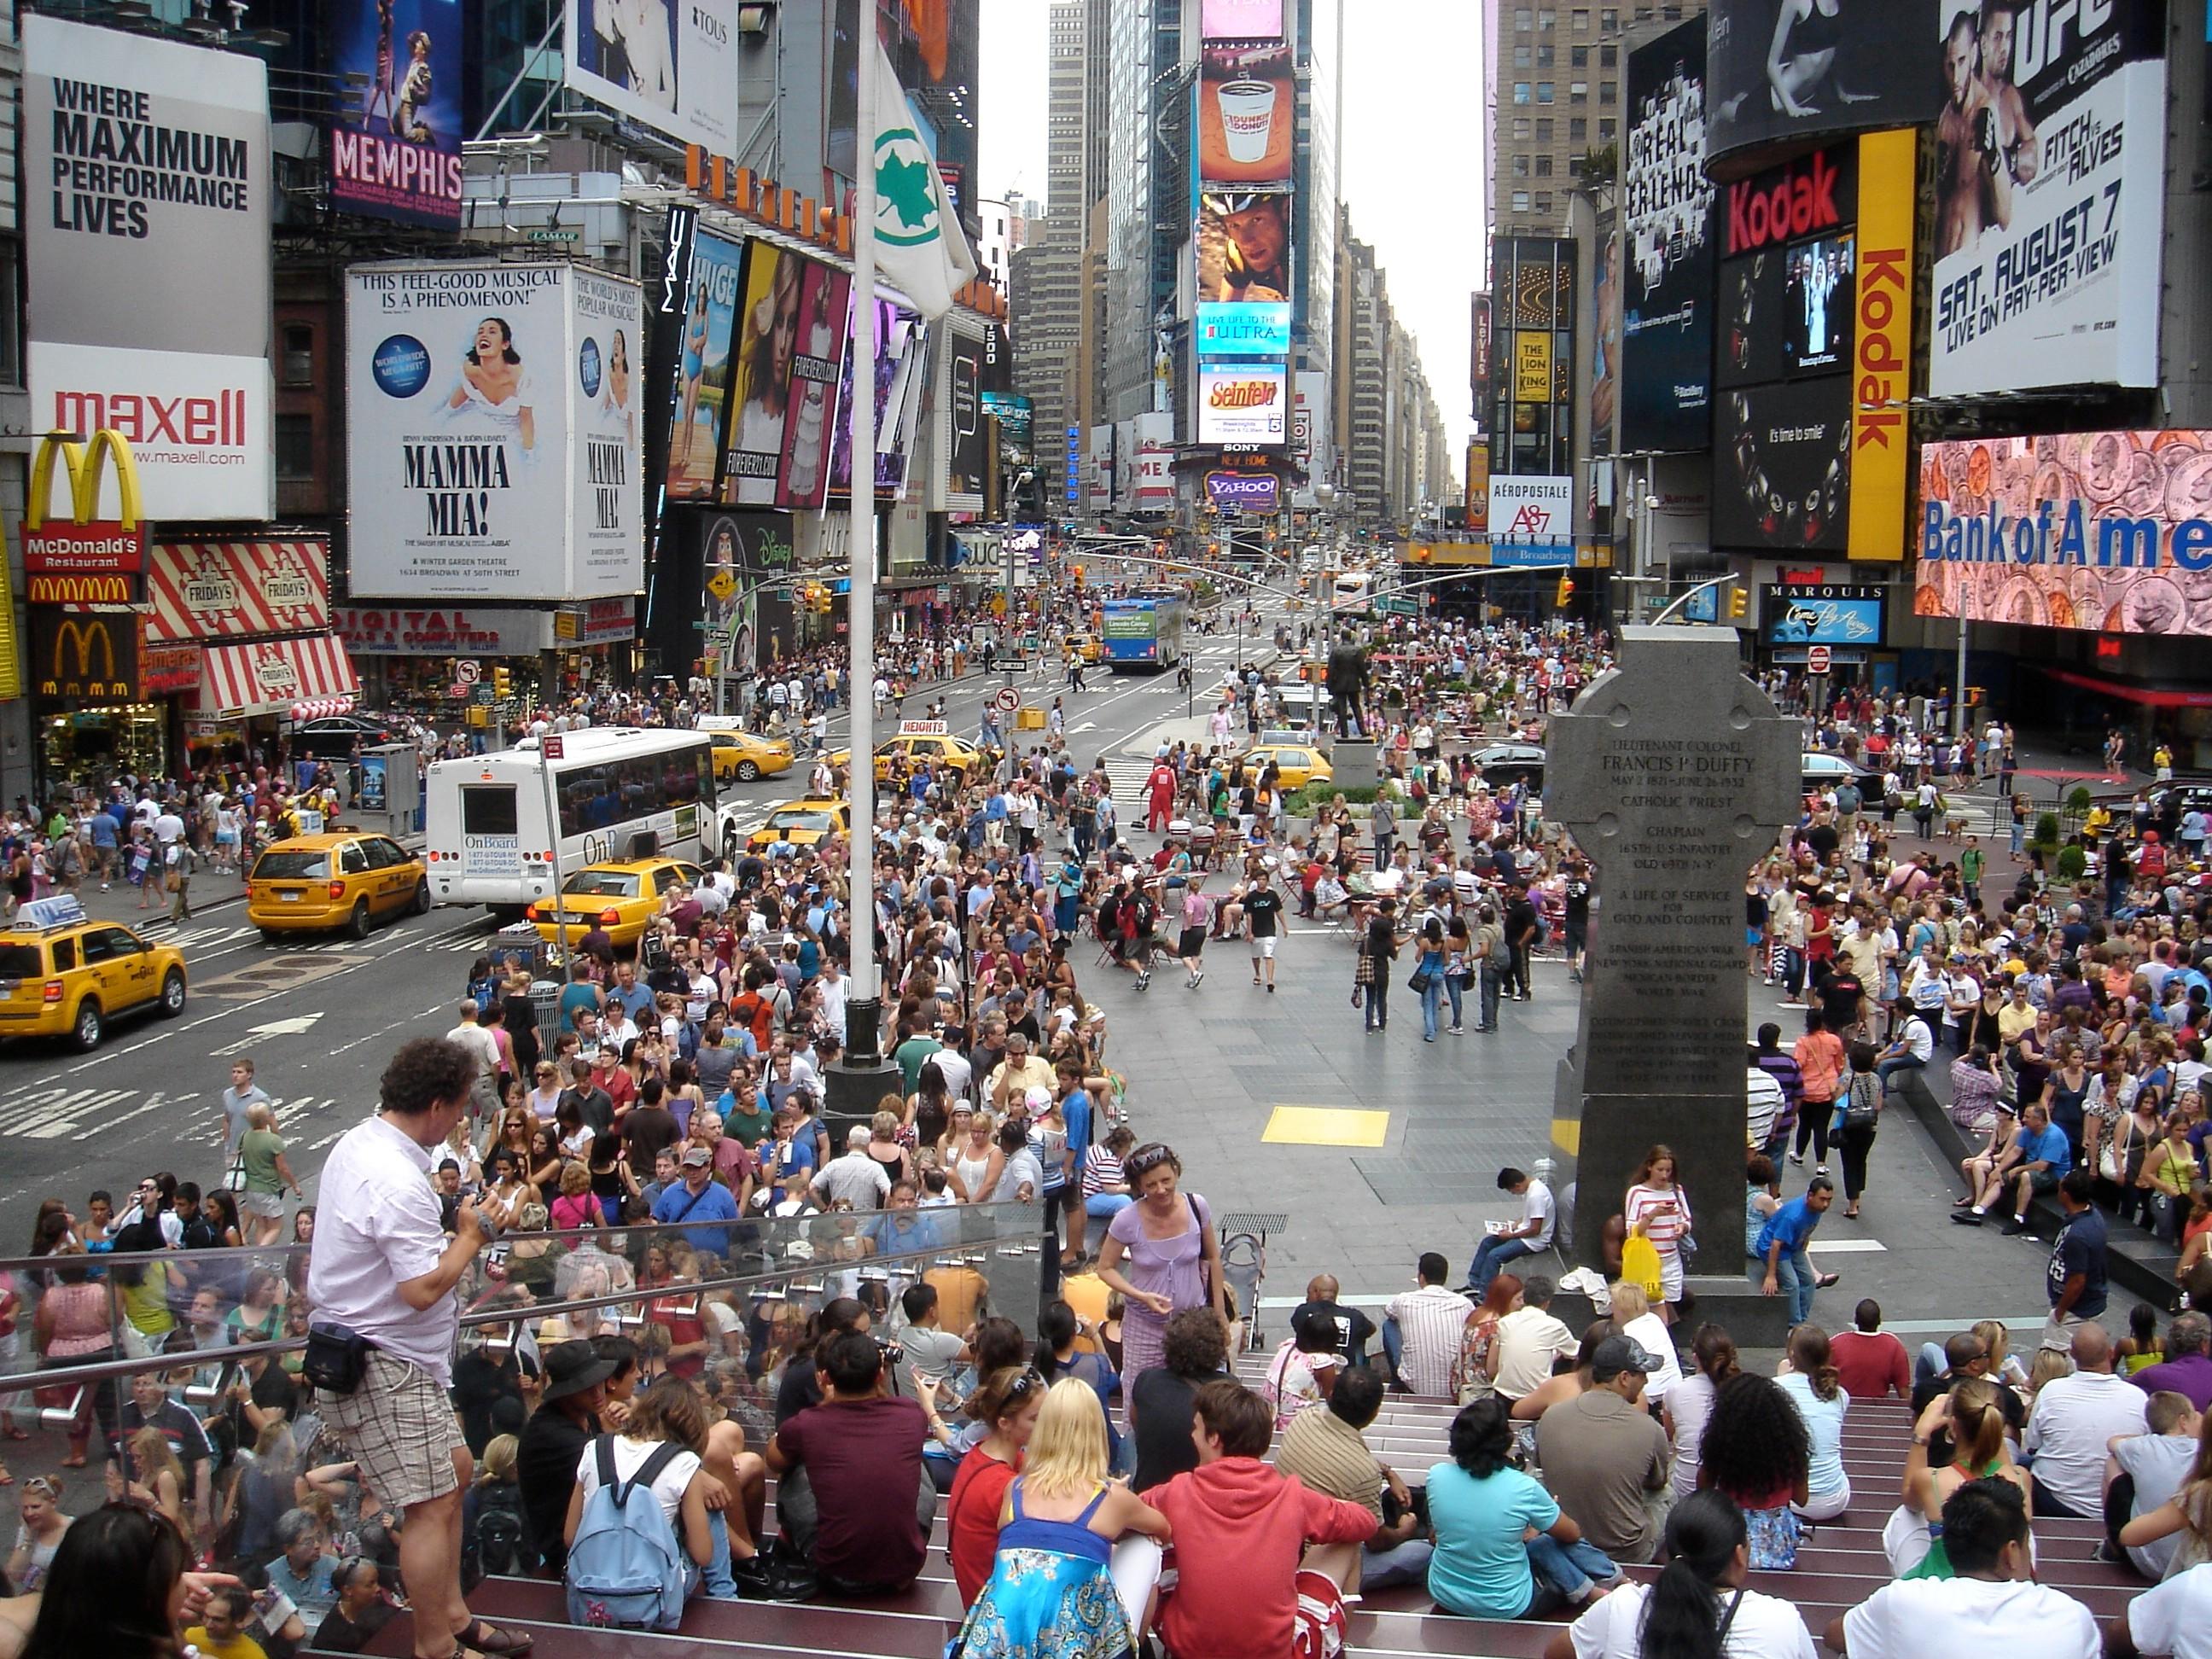 Times square New York.JPG